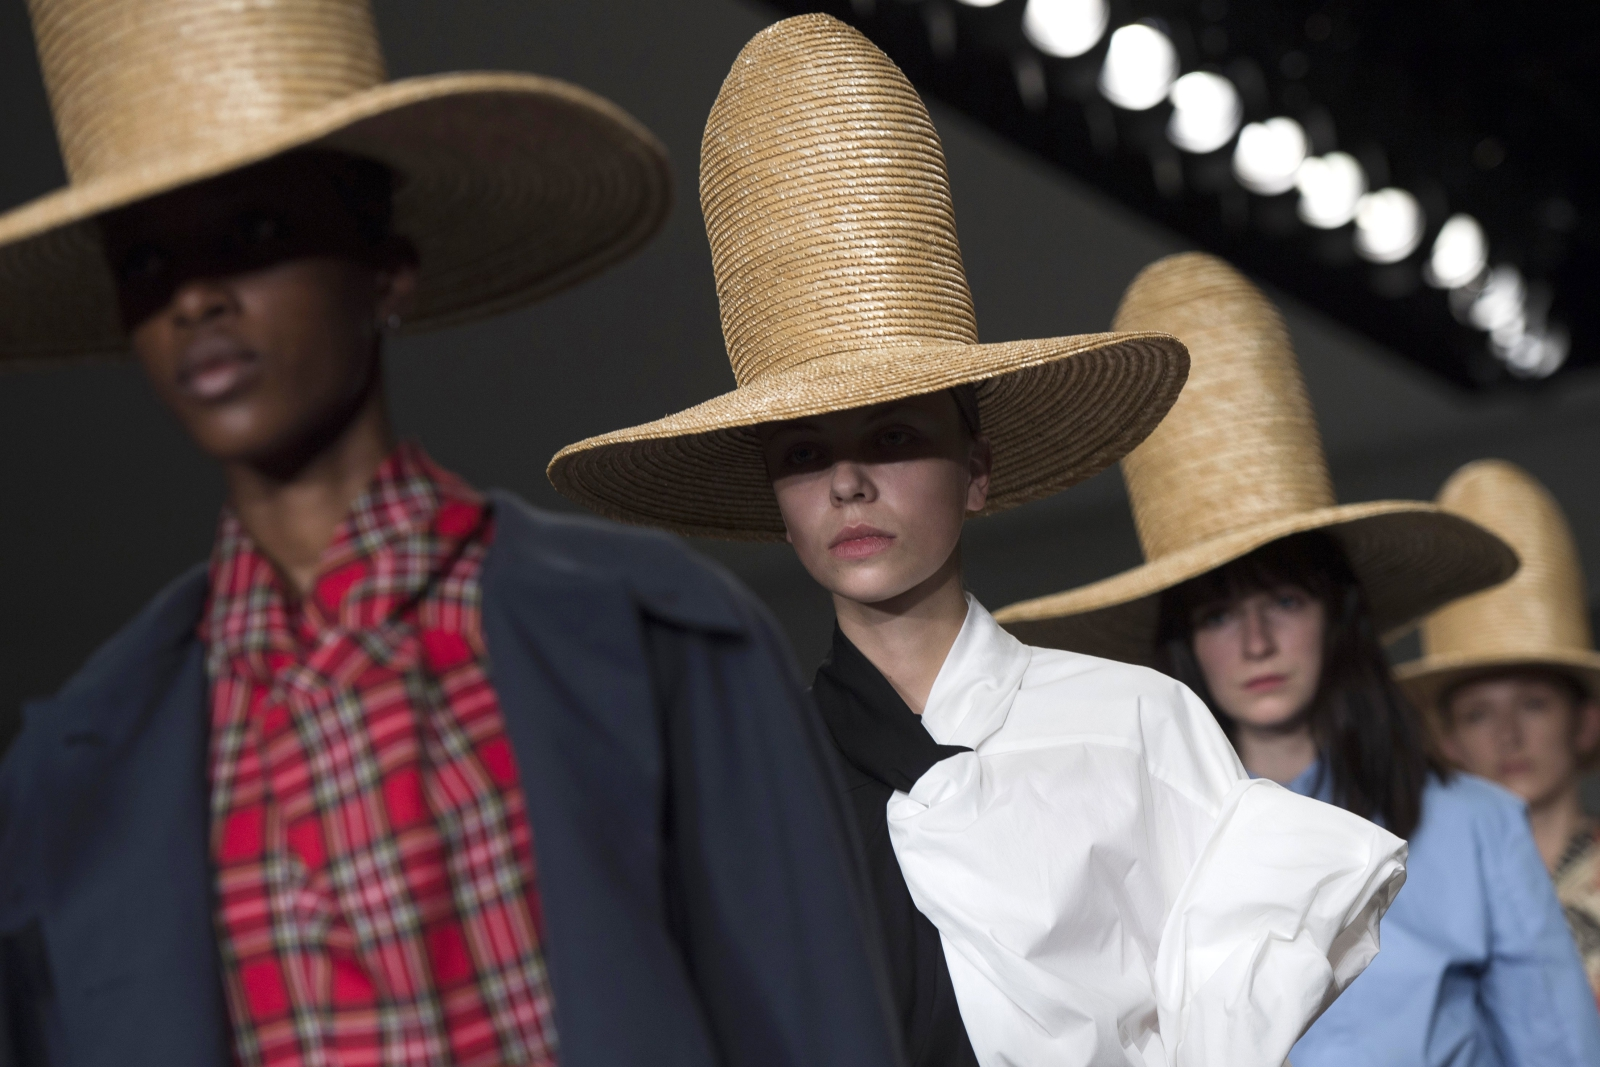 Fashion Week, in London EPA/WILL OLIVER